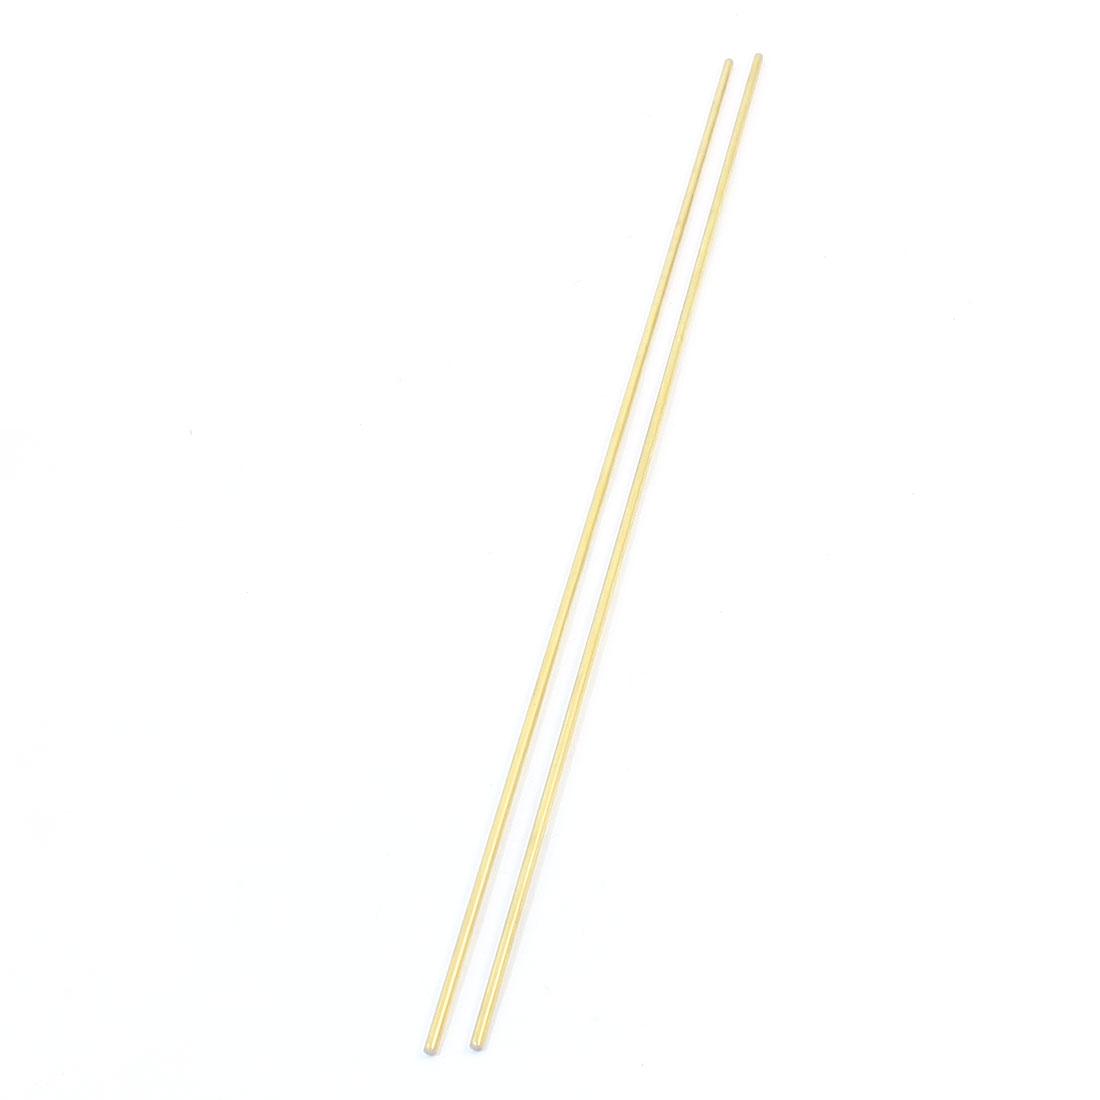 2Pcs CNC Machining Gold Tone Brass Round Bar Rods 450mm x 3mm